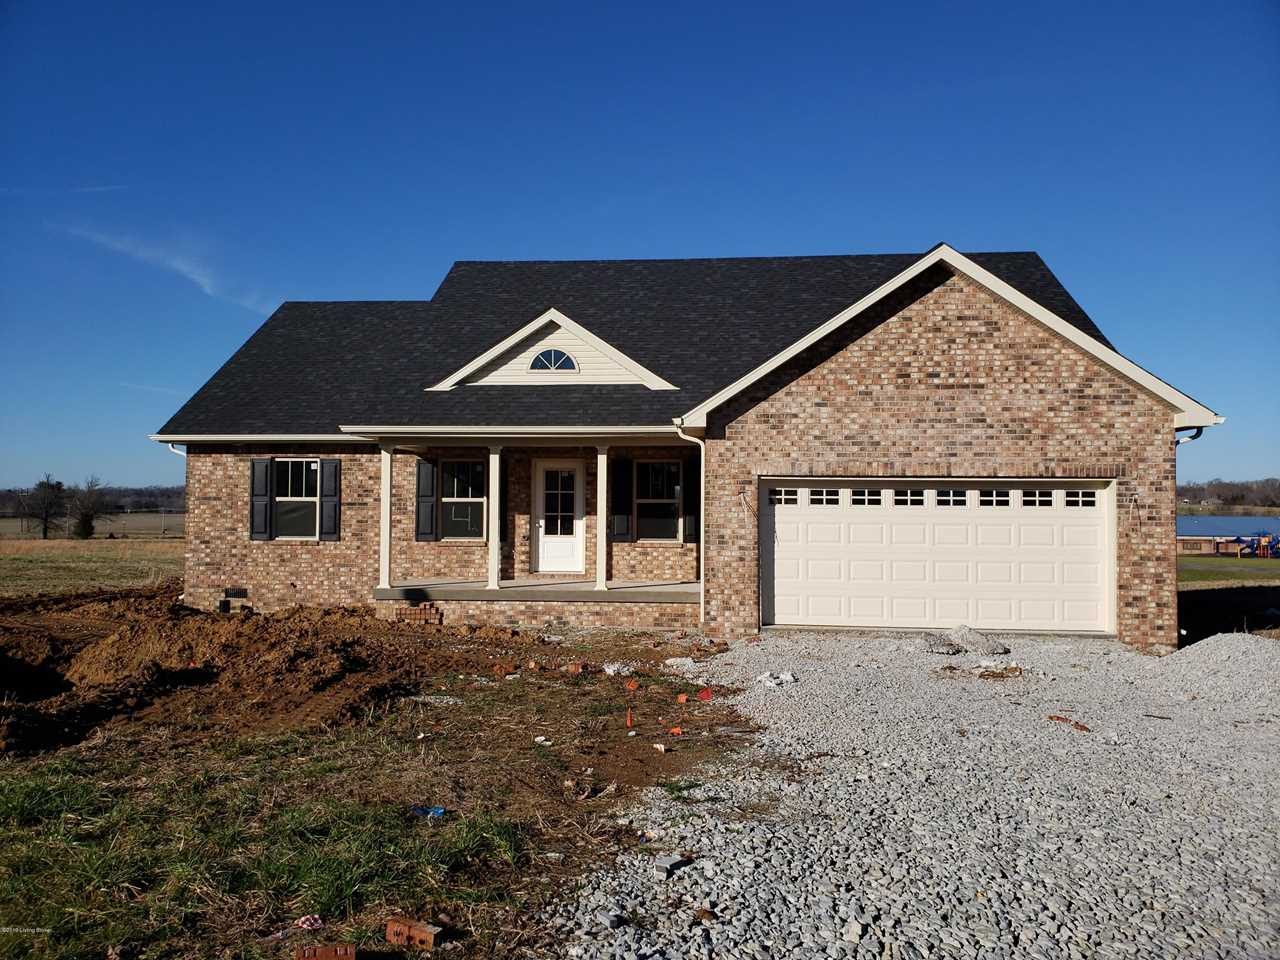 59 Oak Leaf Ct Taylorsville, KY 40071 | MLS 1508646 Photo 1